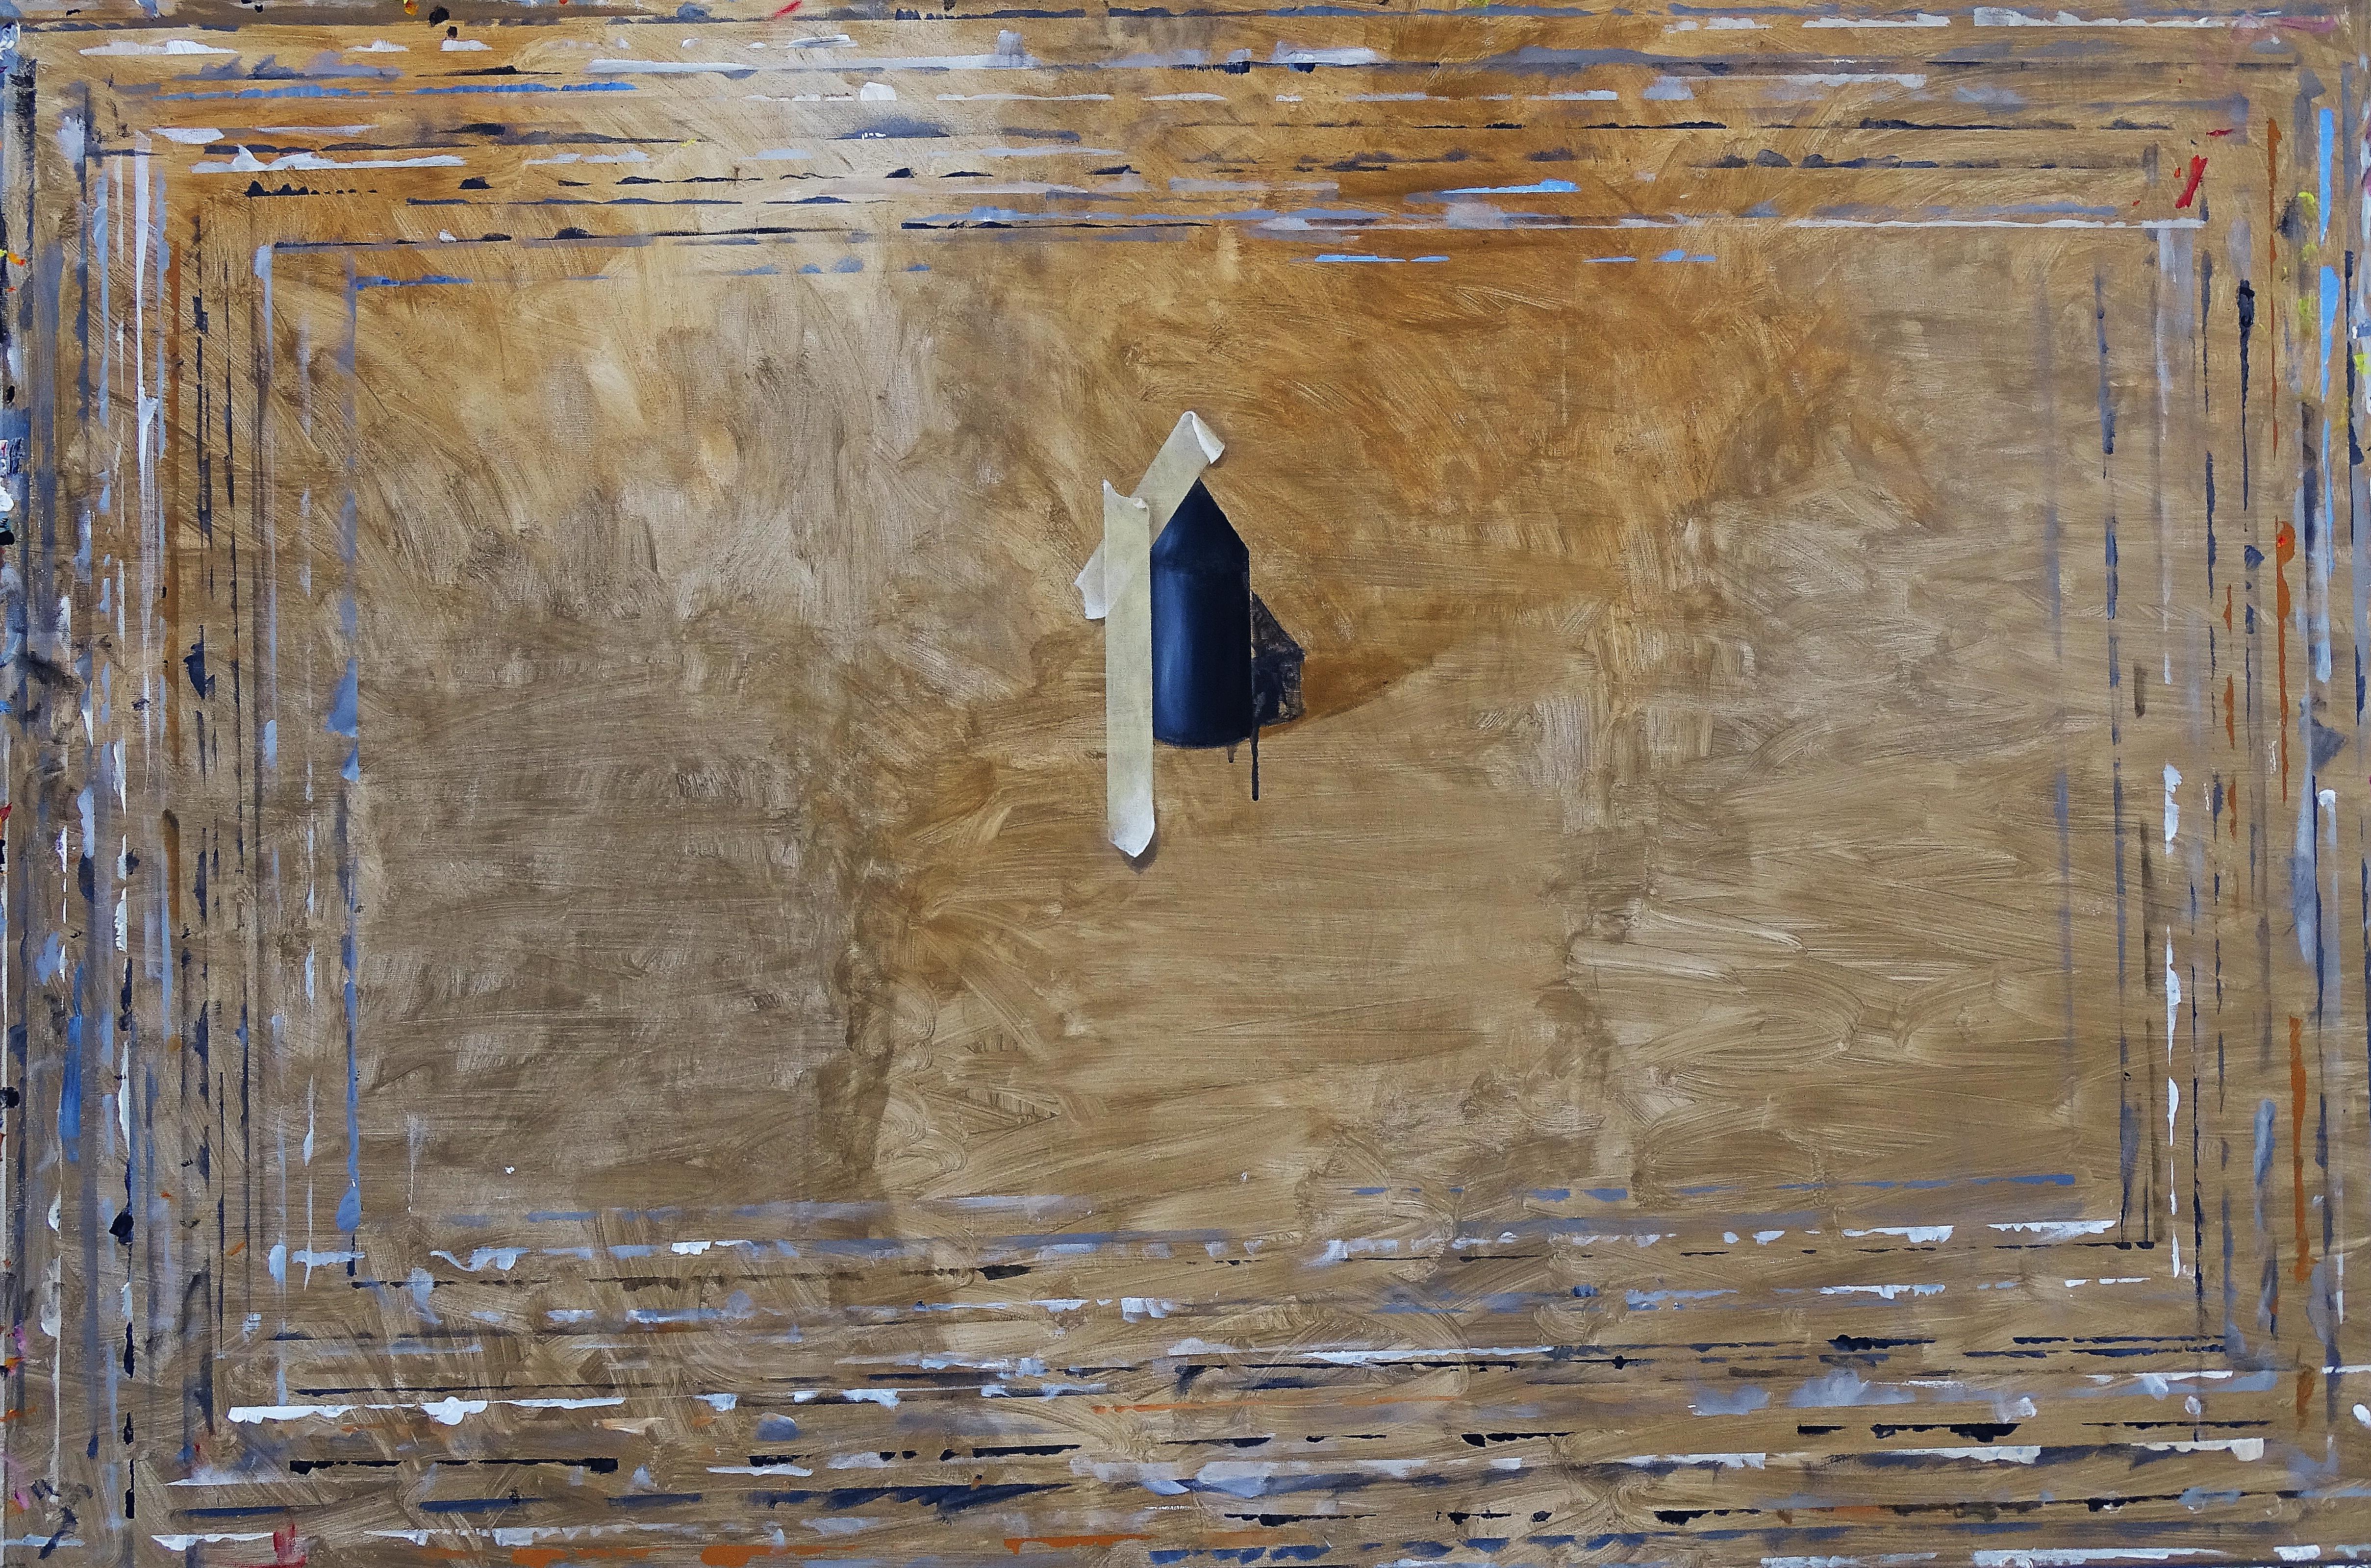 Dariusz Mlącki 2016,Deska z Kościółkiem, 100x150,akryl olej na płótnie